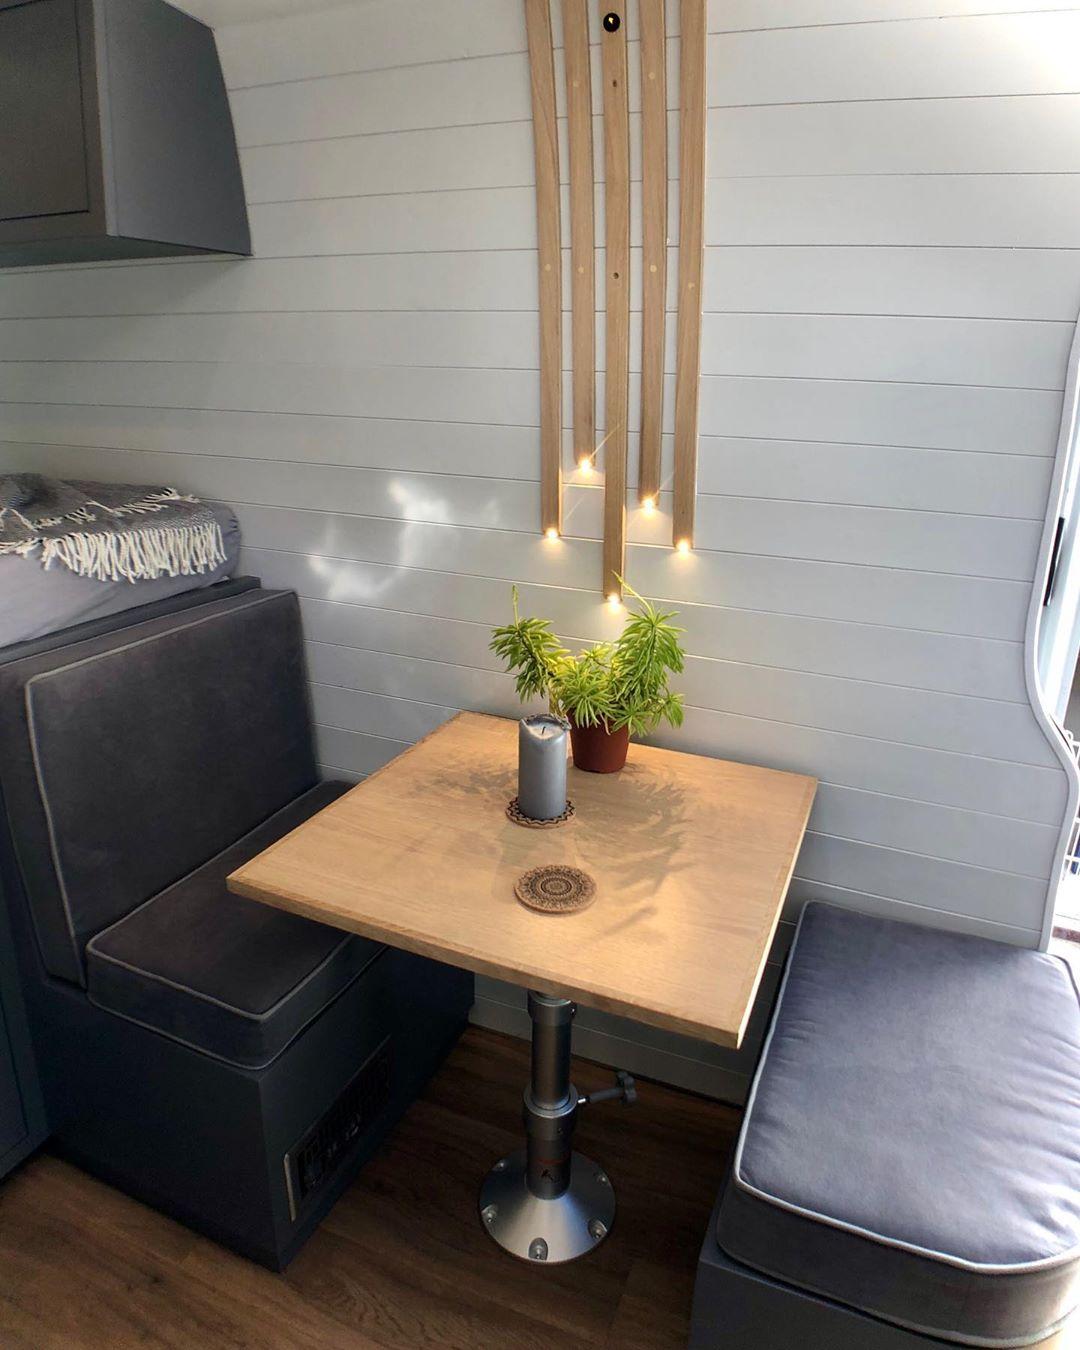 116971835 732785677267682 4863427757646668001 n - Furniture maker converts builder's van into luxurious camper during COVID-19 lockdown